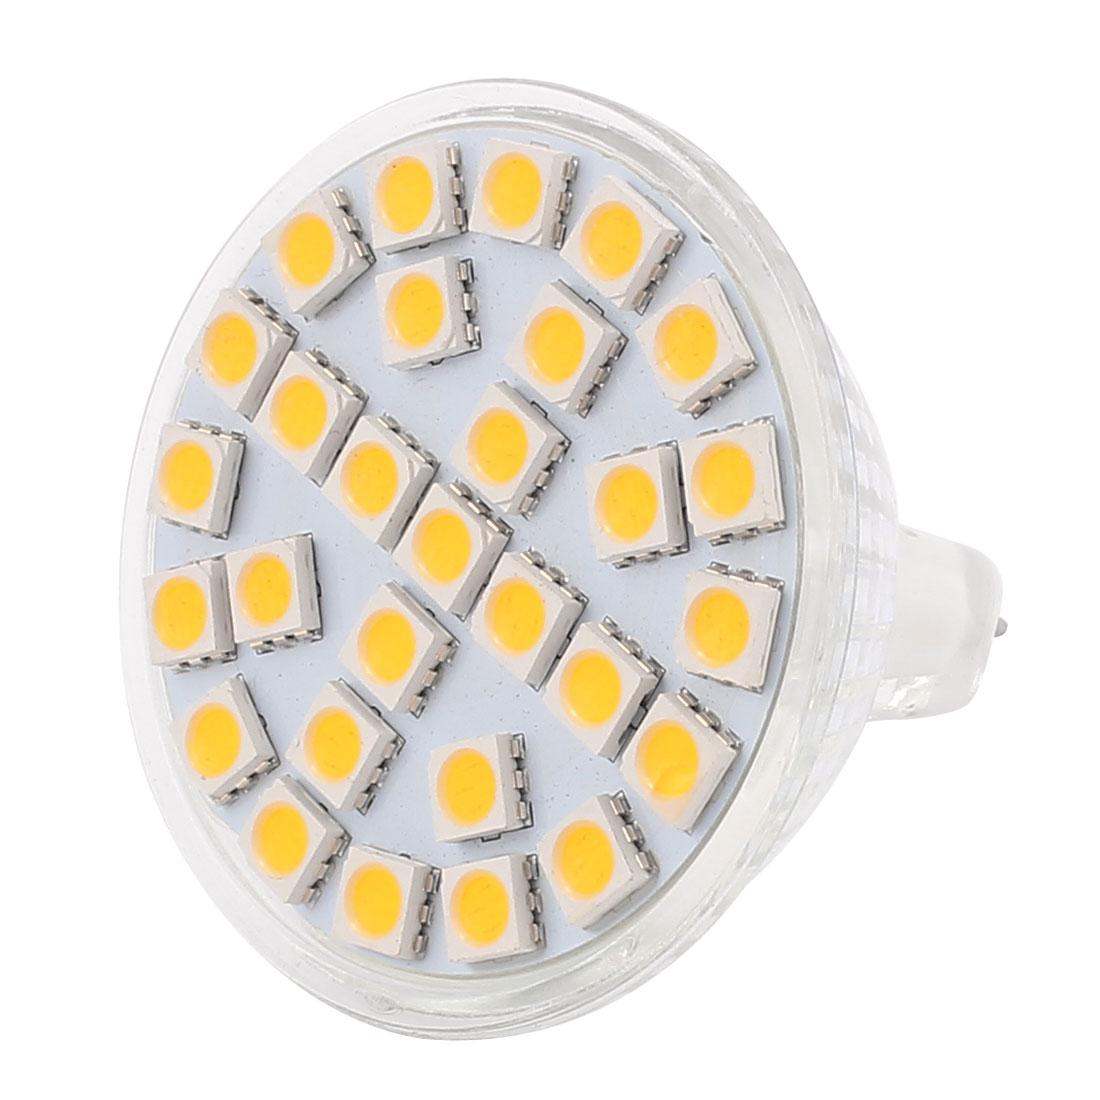 MR16 SMD5050 29LEDs 5W Glass Energy Saving LED Lamp Bulb Warm White AC 220V